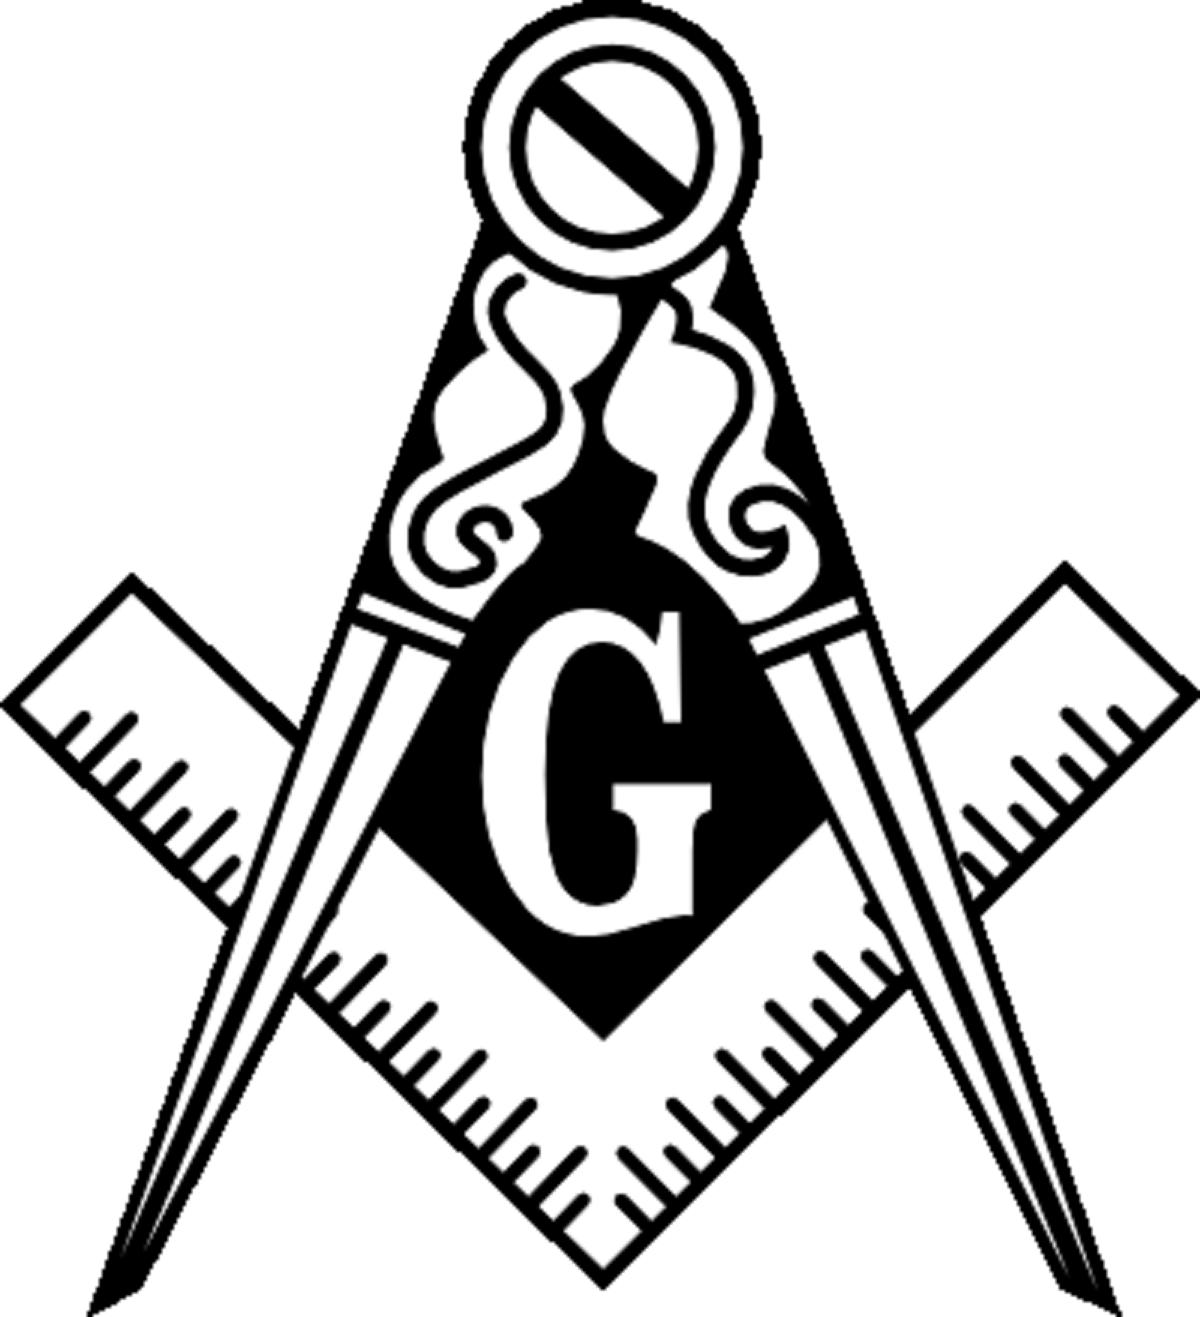 Masonic lodge symbol clip art.